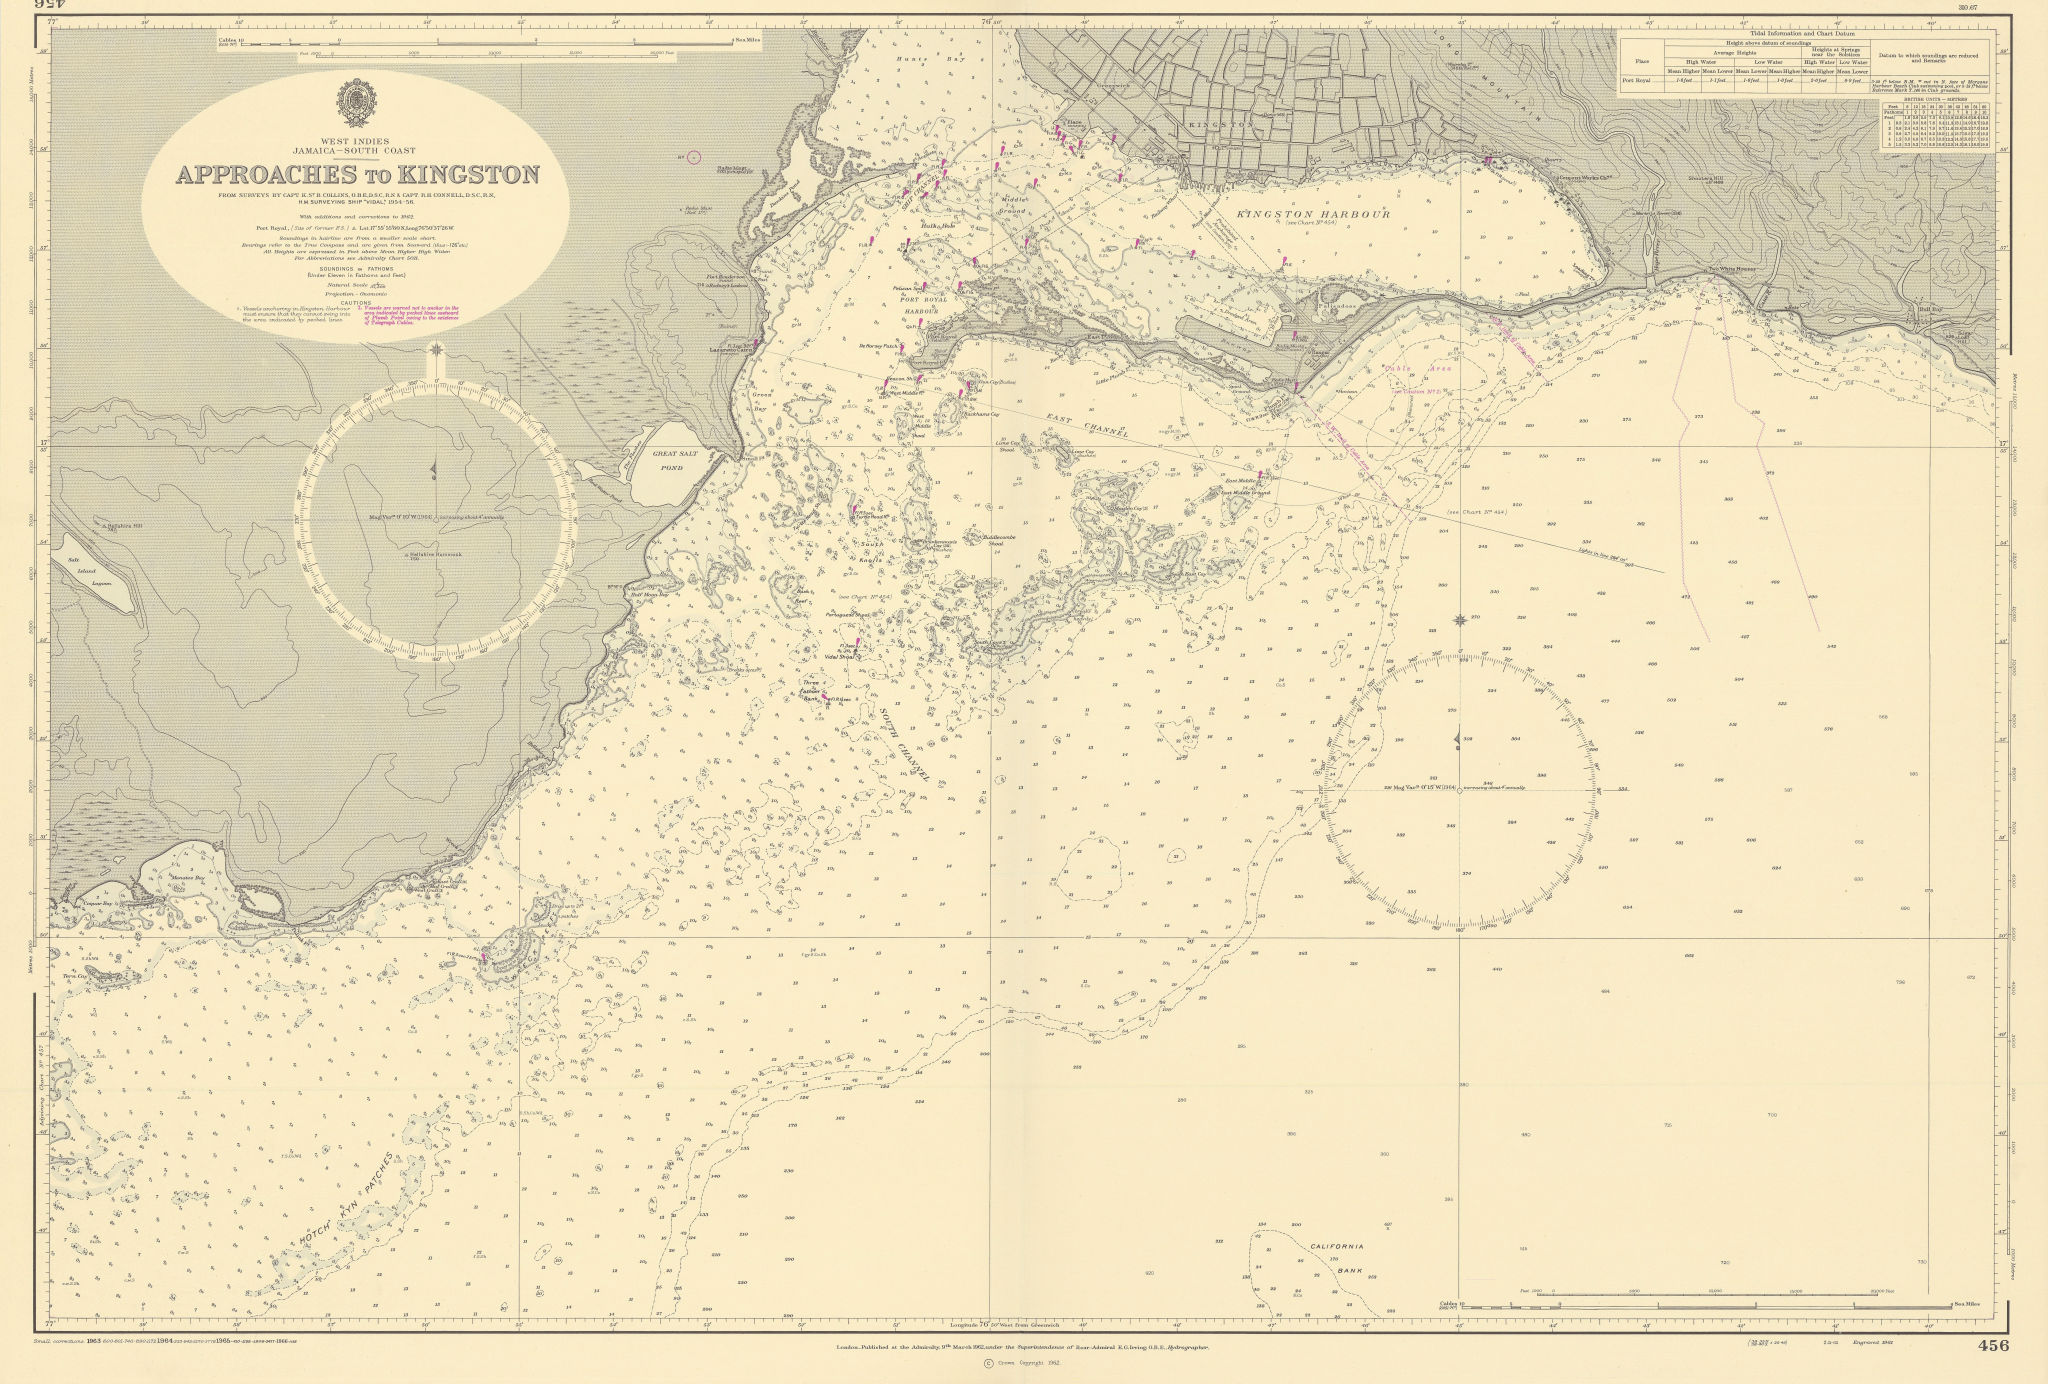 Kingston approach Jamaica south coast Caribbean ADMIRALTY chart 1962 (1966) map